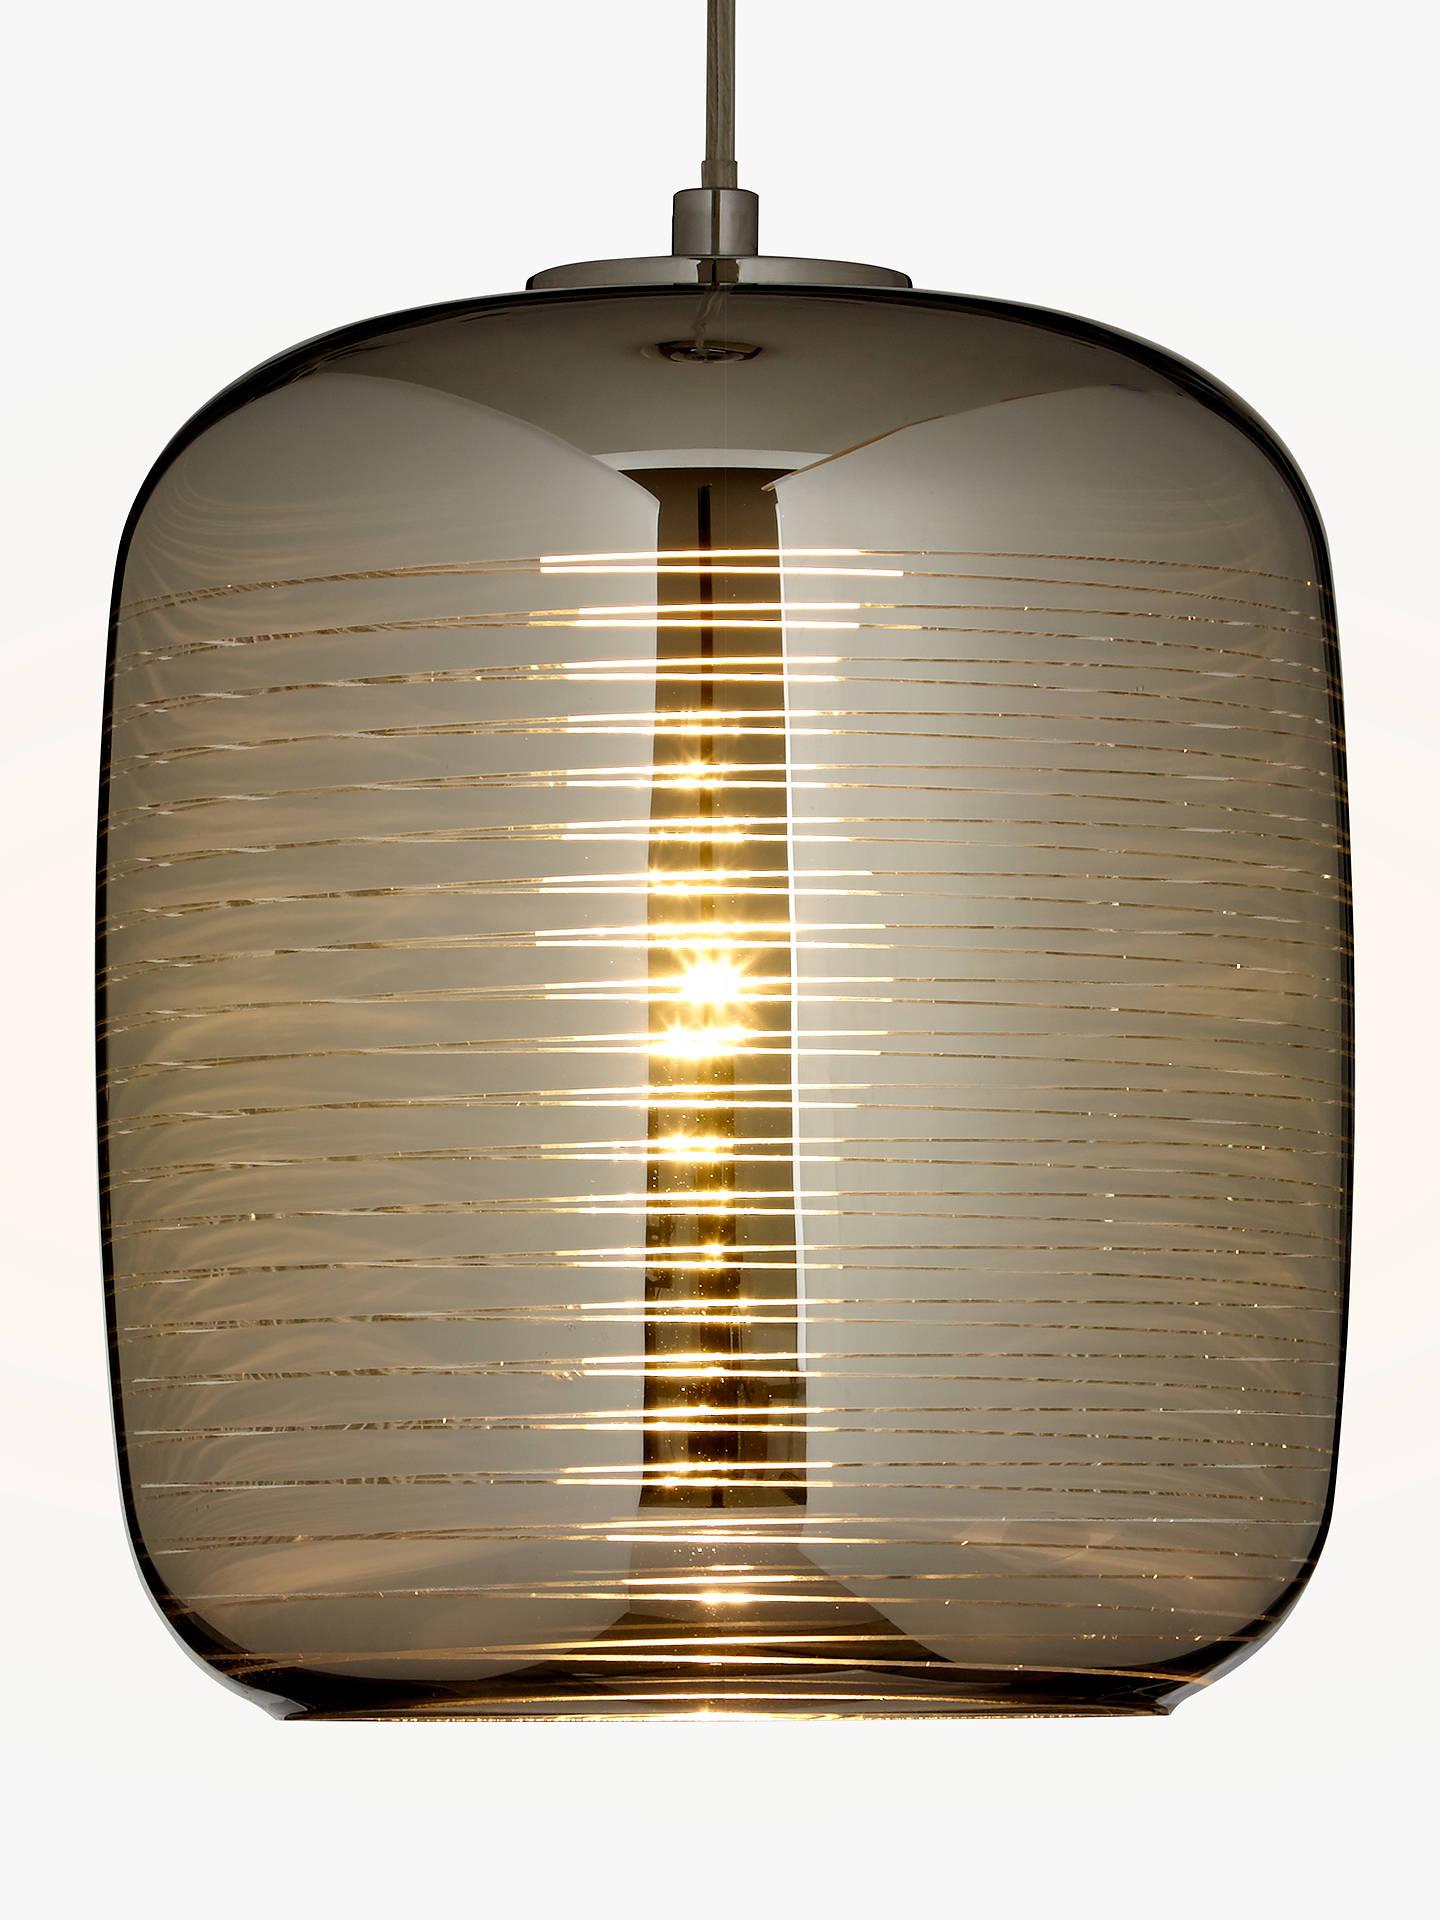 John lewis pluto horizon stripe pendant ceiling light at john lewis buyjohn lewis pluto horizon stripe pendant ceiling light online at johnlewis aloadofball Image collections